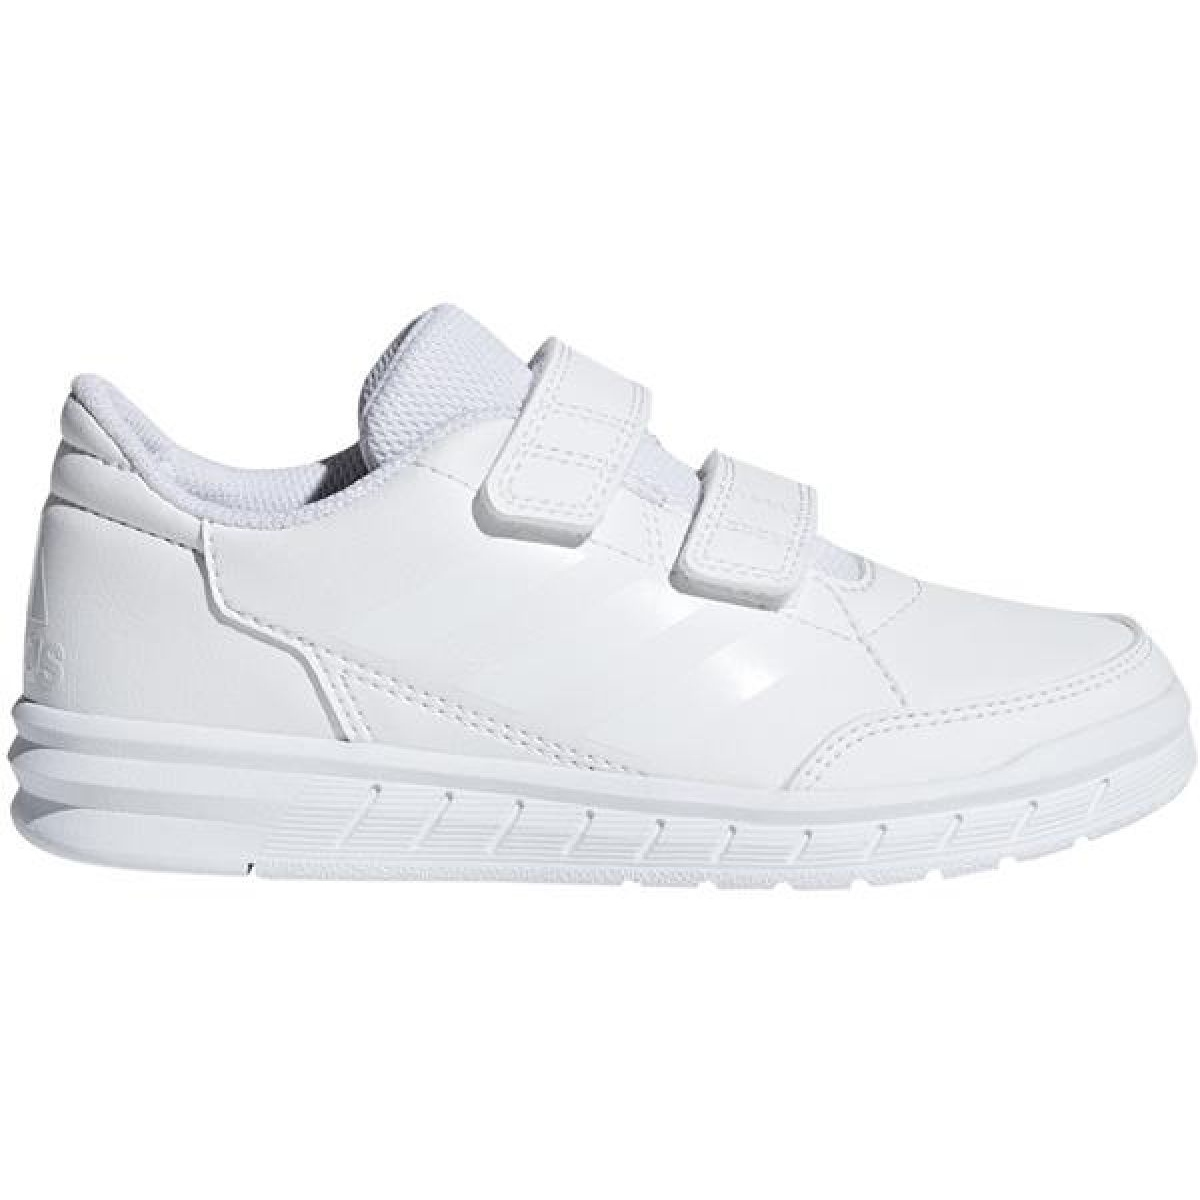 Altasport Cf Adidas K D96832 Zapatillas Jr Blanco 0Onk8wXP